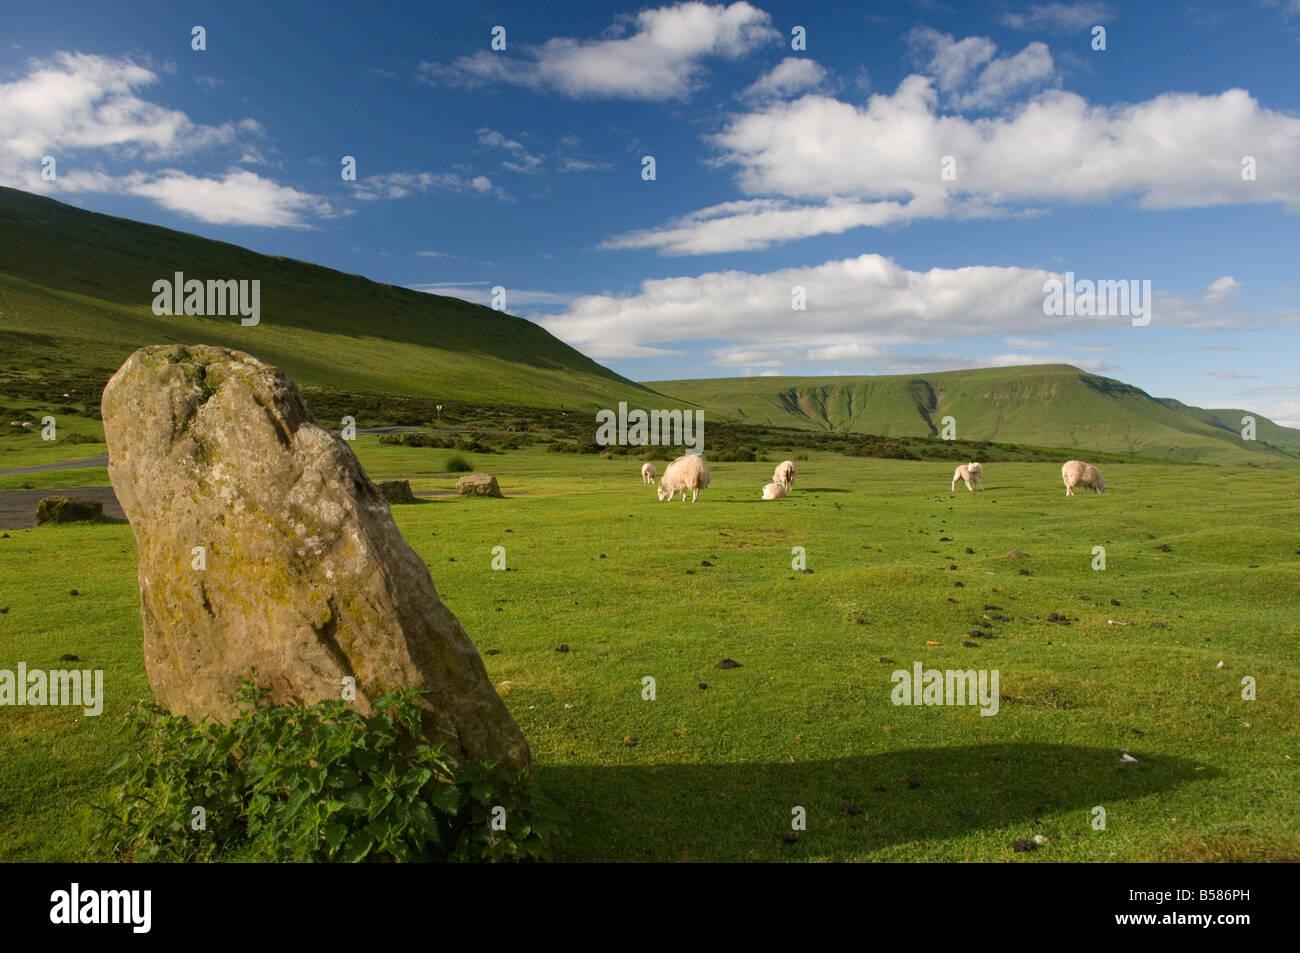 Bluff, cerca de heno heno en Wye, Brecon Beacons, Powys, Gales, Reino Unido, Europa Foto de stock